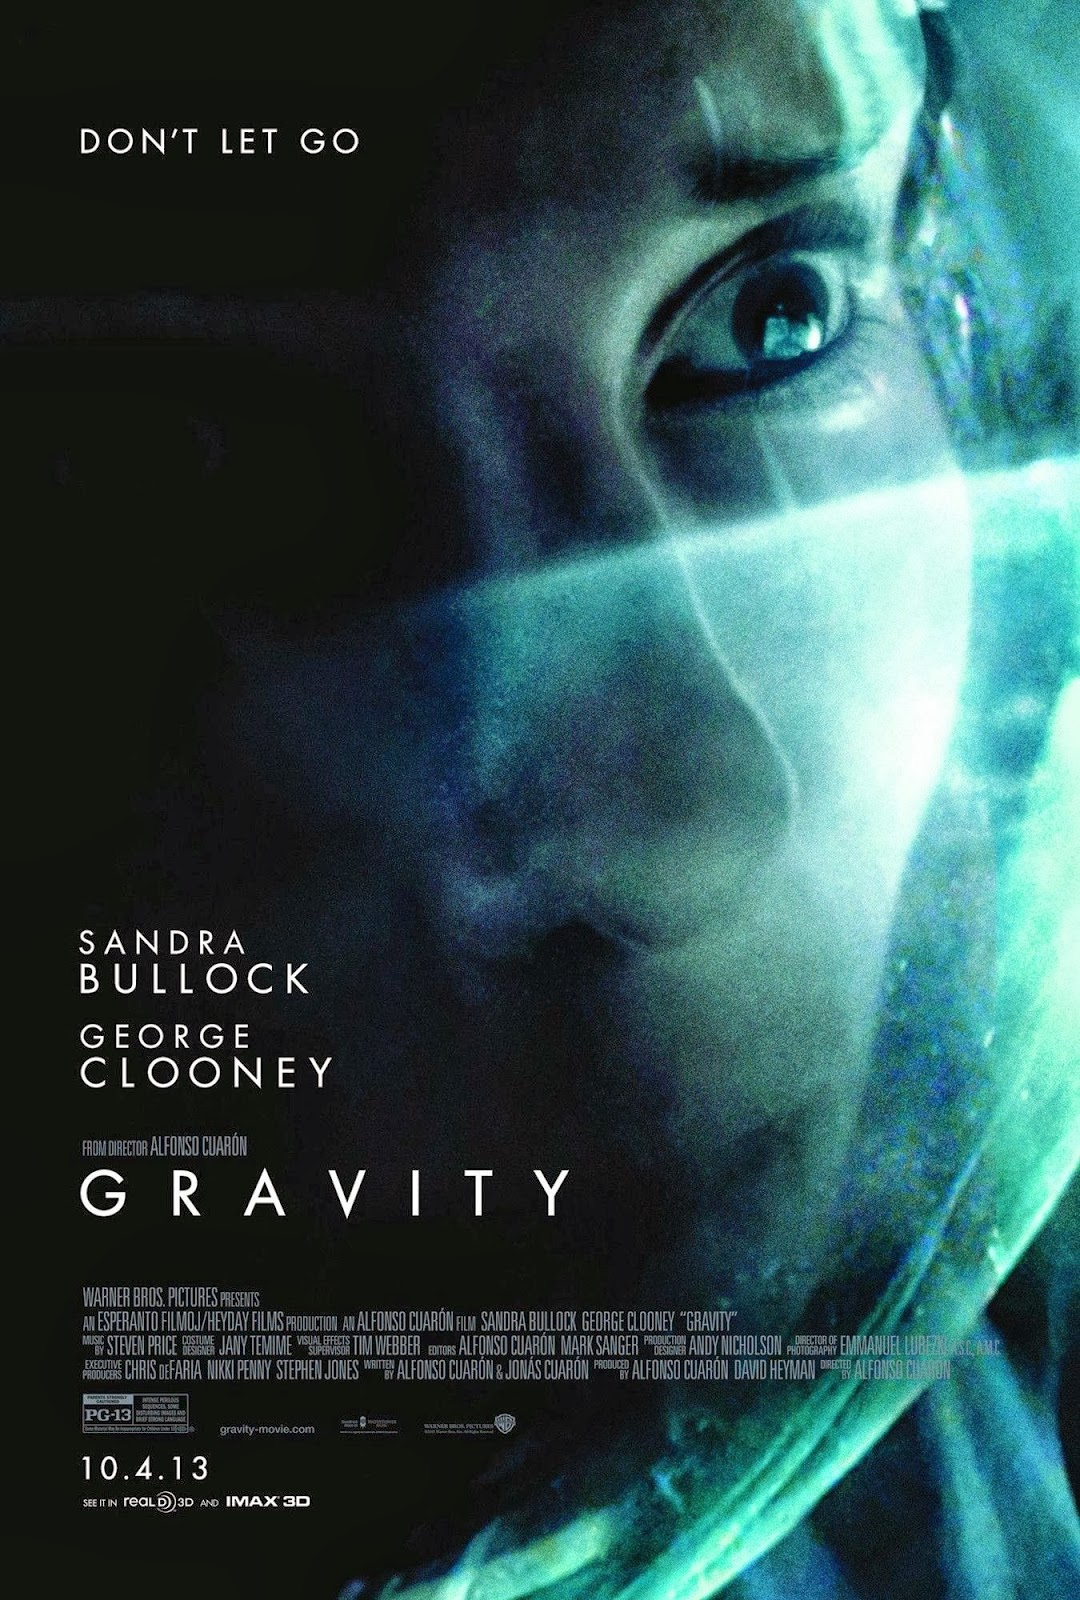 full movie gravity hd stream gravity movie free watch gravity online